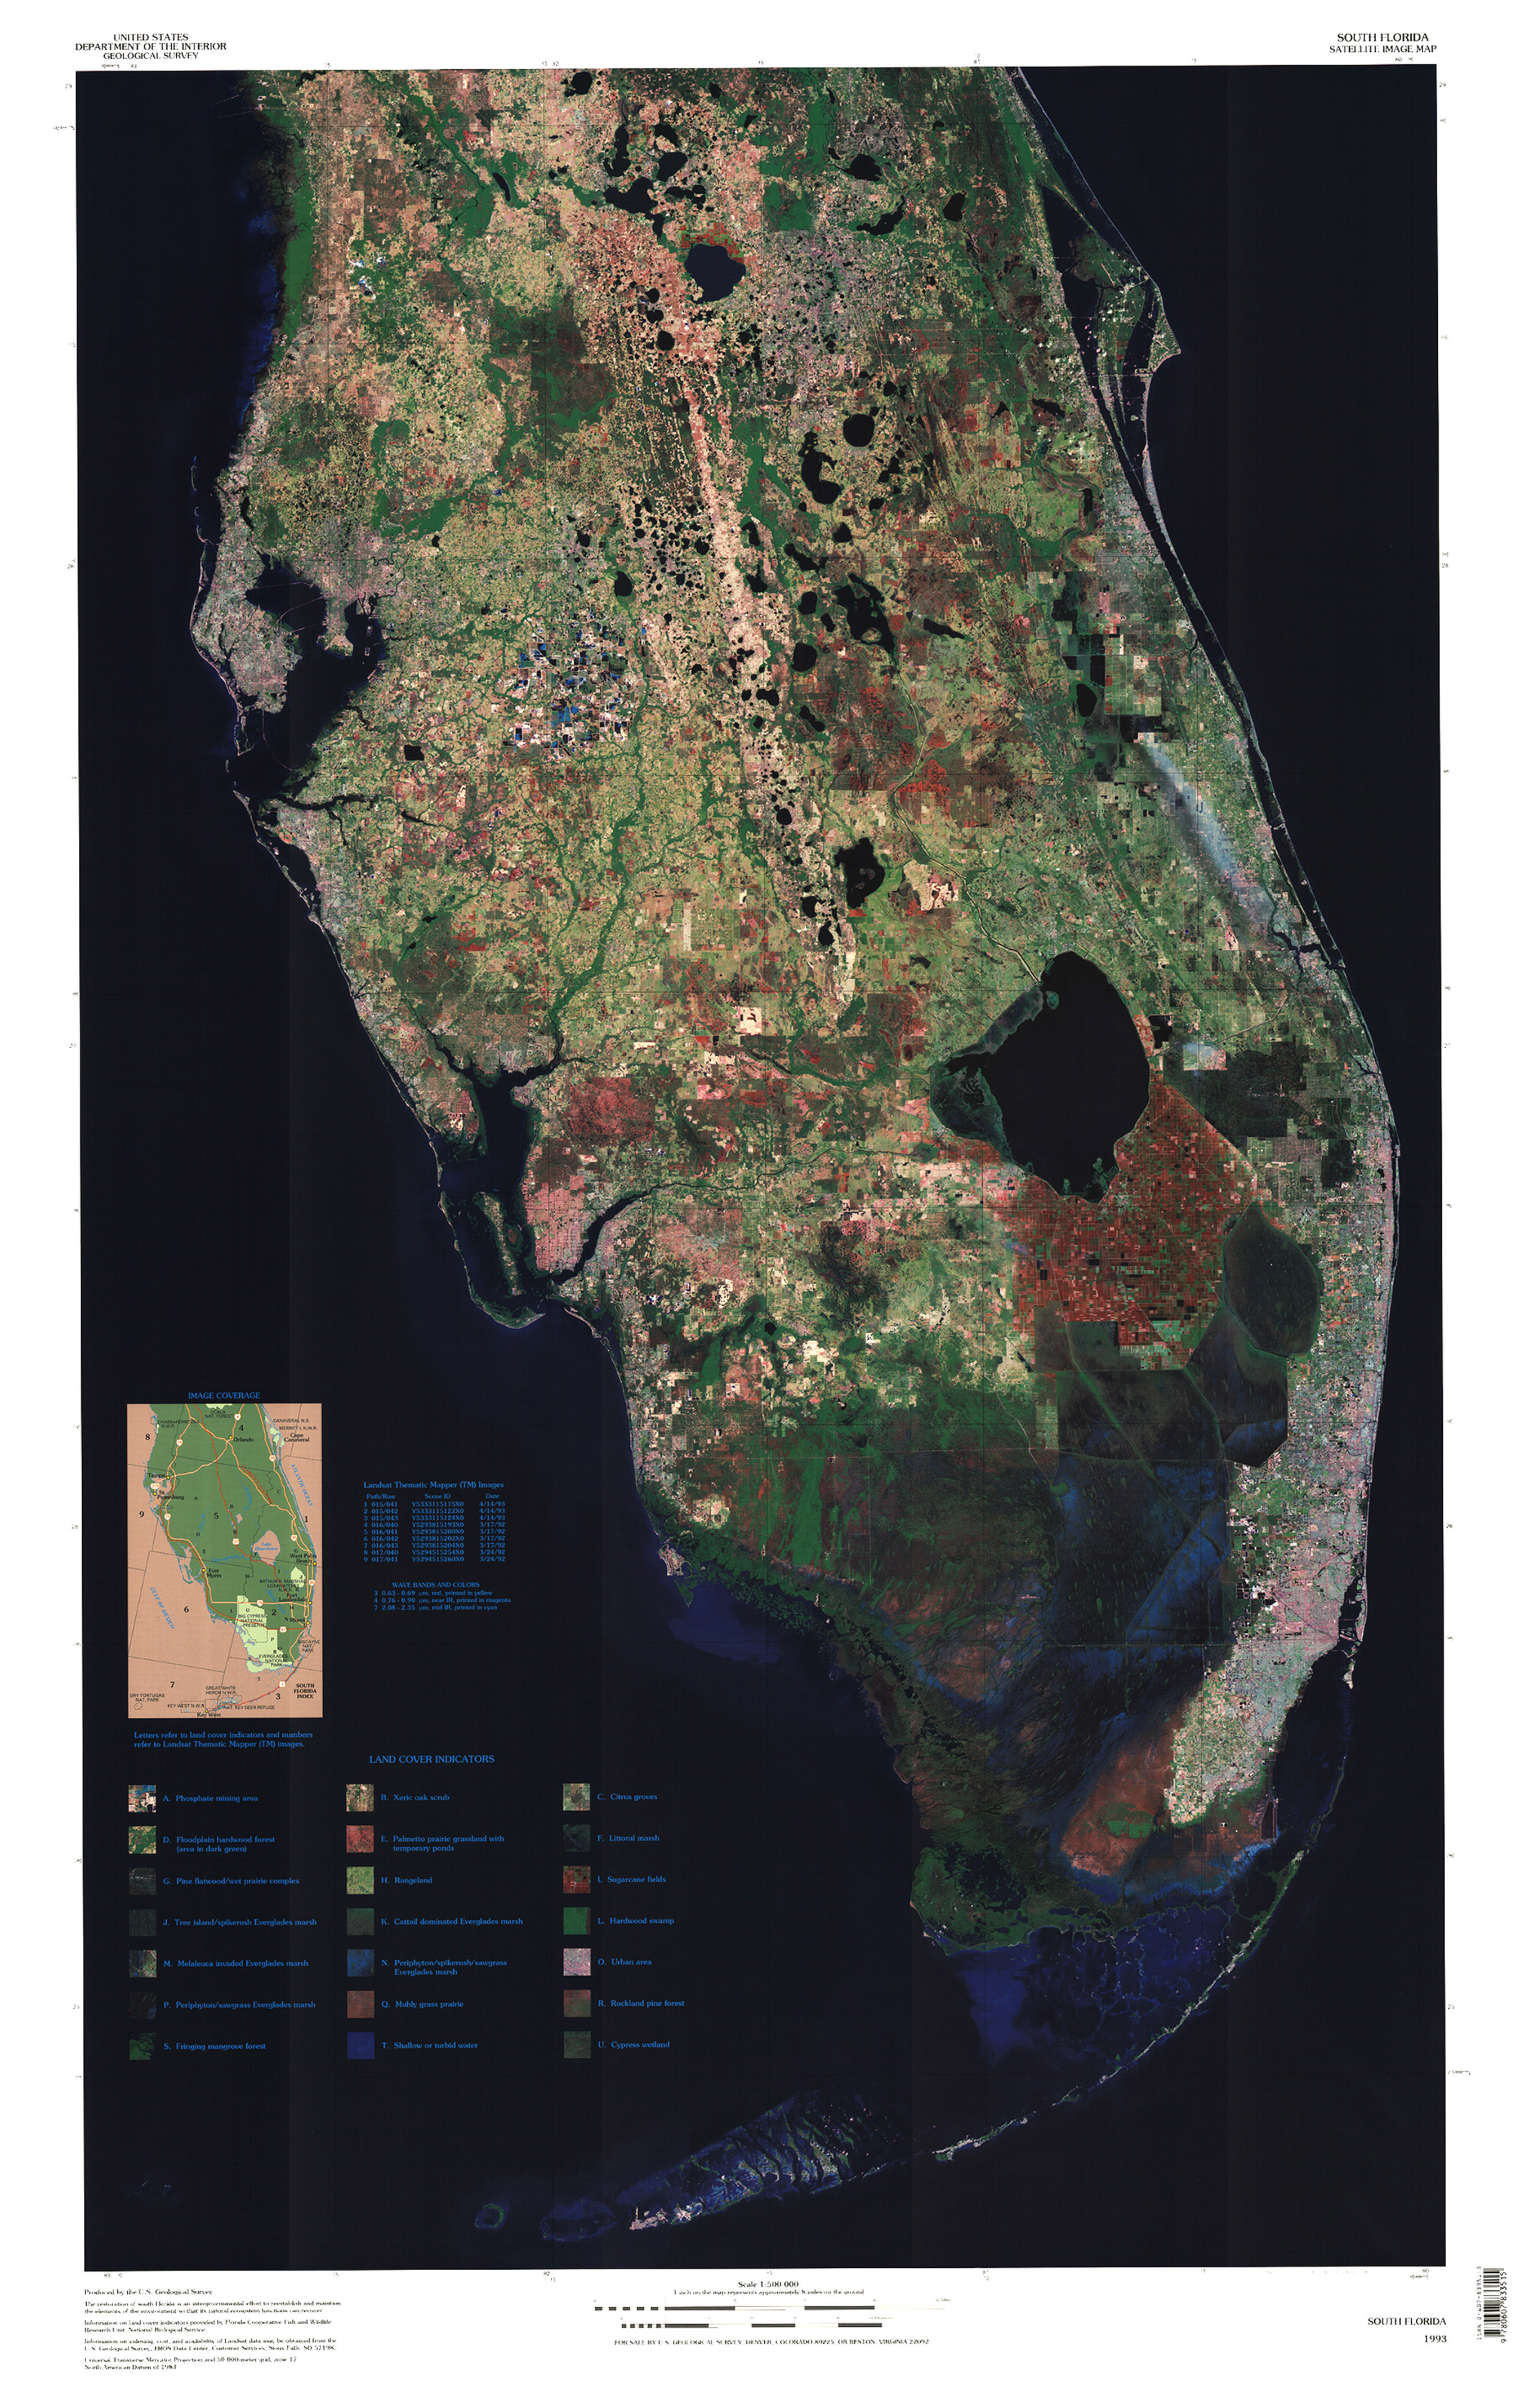 Southern Florida Map.File South Florida Satellite Image Map Jpg Wikimedia Commons